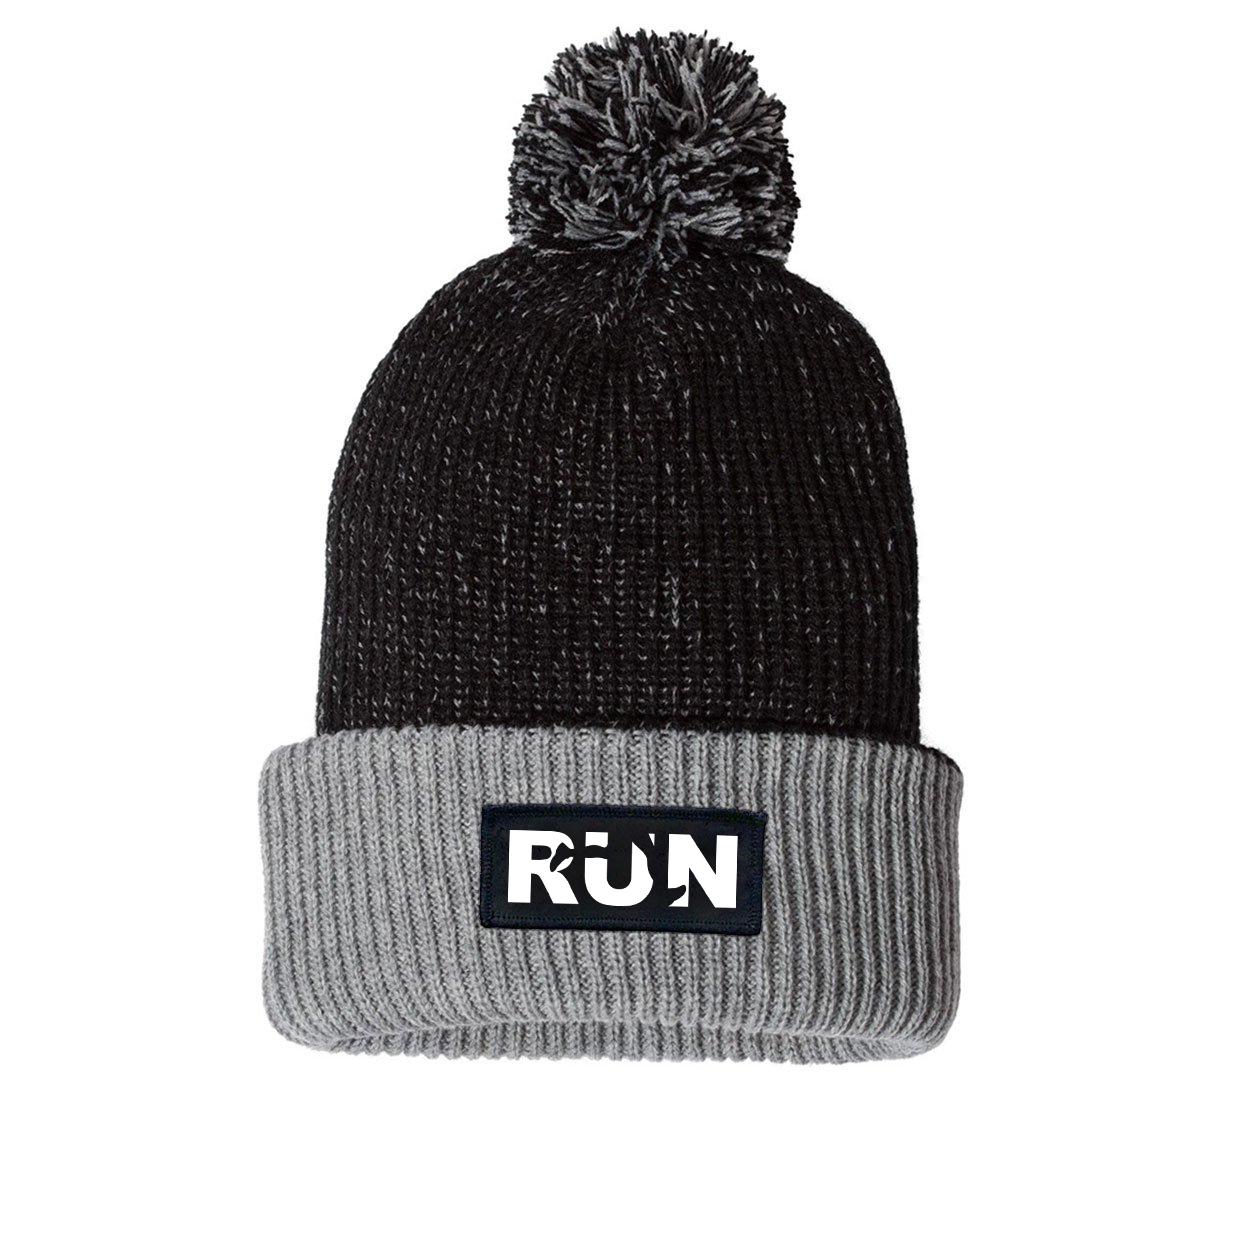 Run Jog Logo Night Out Woven Patch Roll Up Pom Knit Beanie Black/Gray (White Logo)